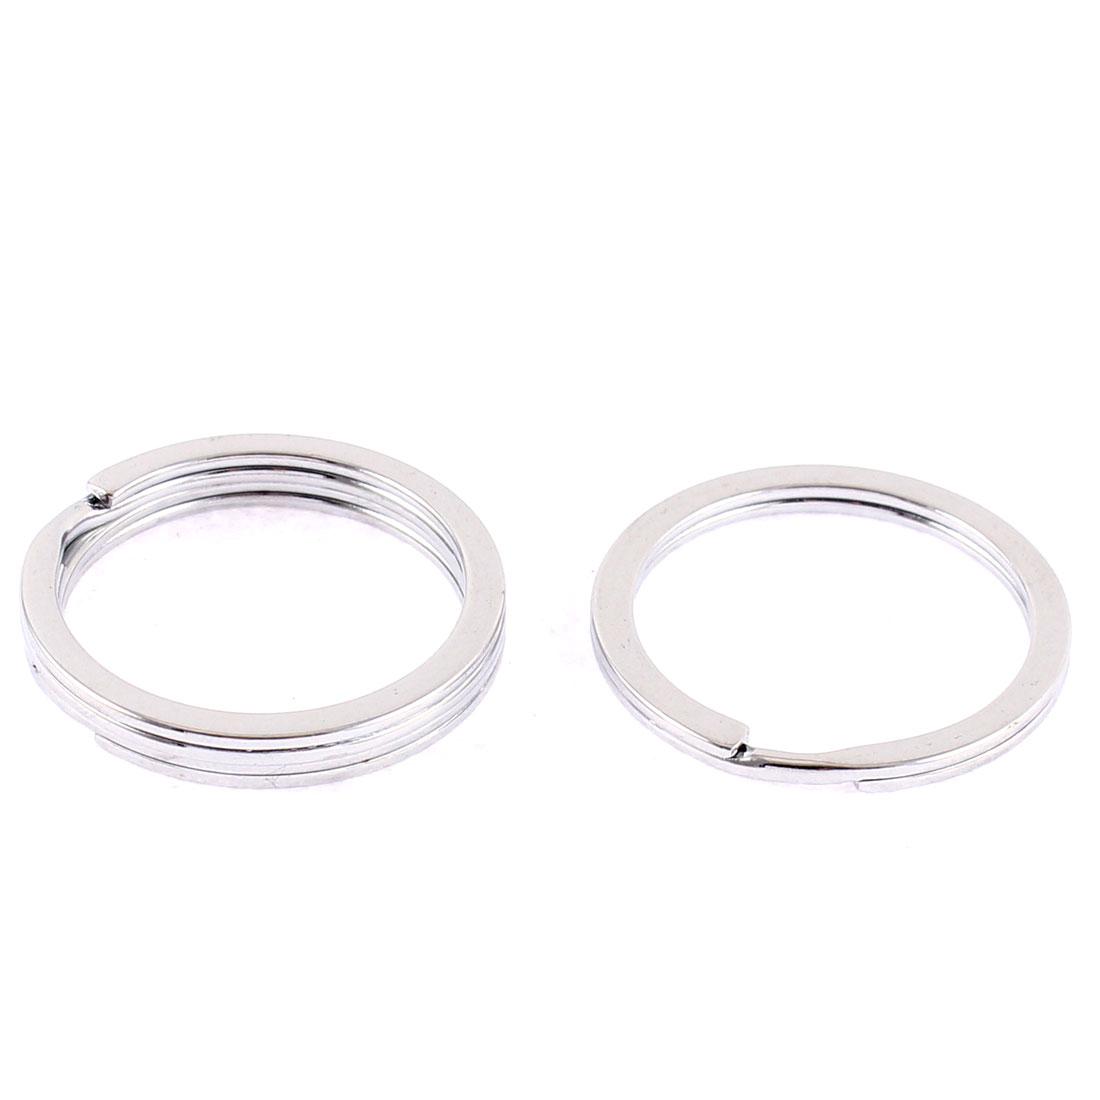 3 Pcs Metal Round Dual Loop Split Key Ring Keychain 30mm Outside Dia